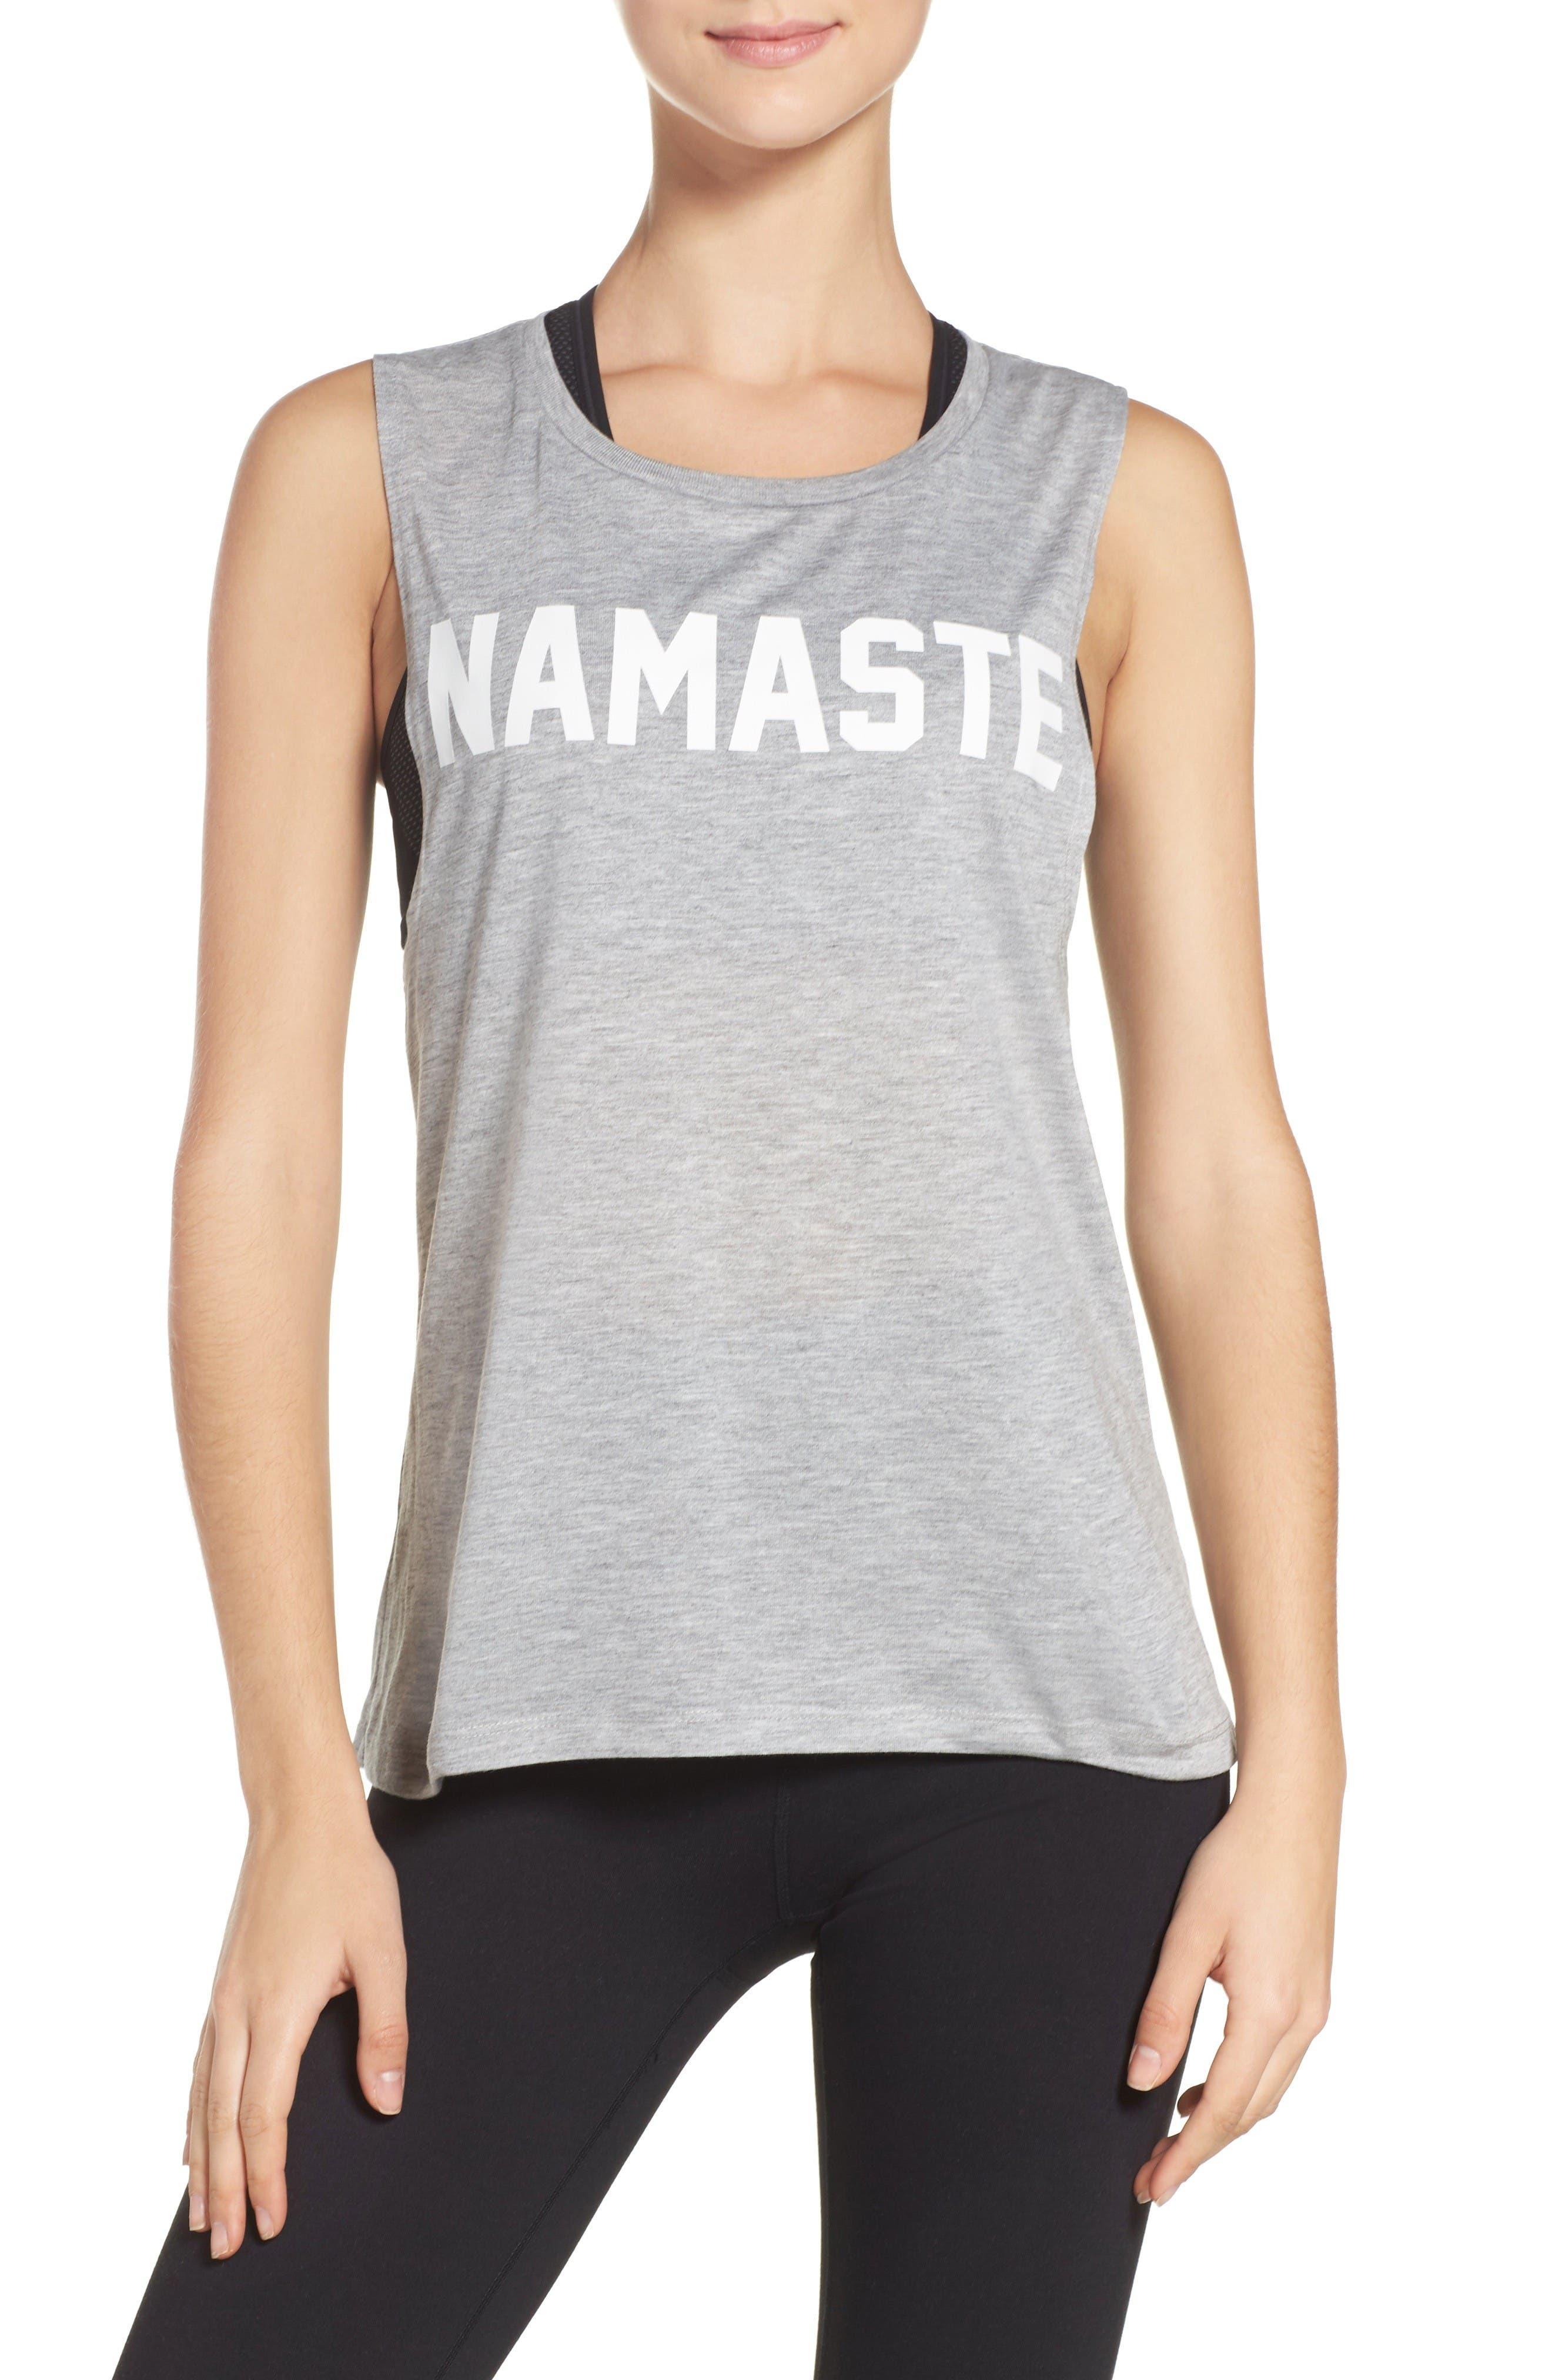 Private Party Namaste Tank